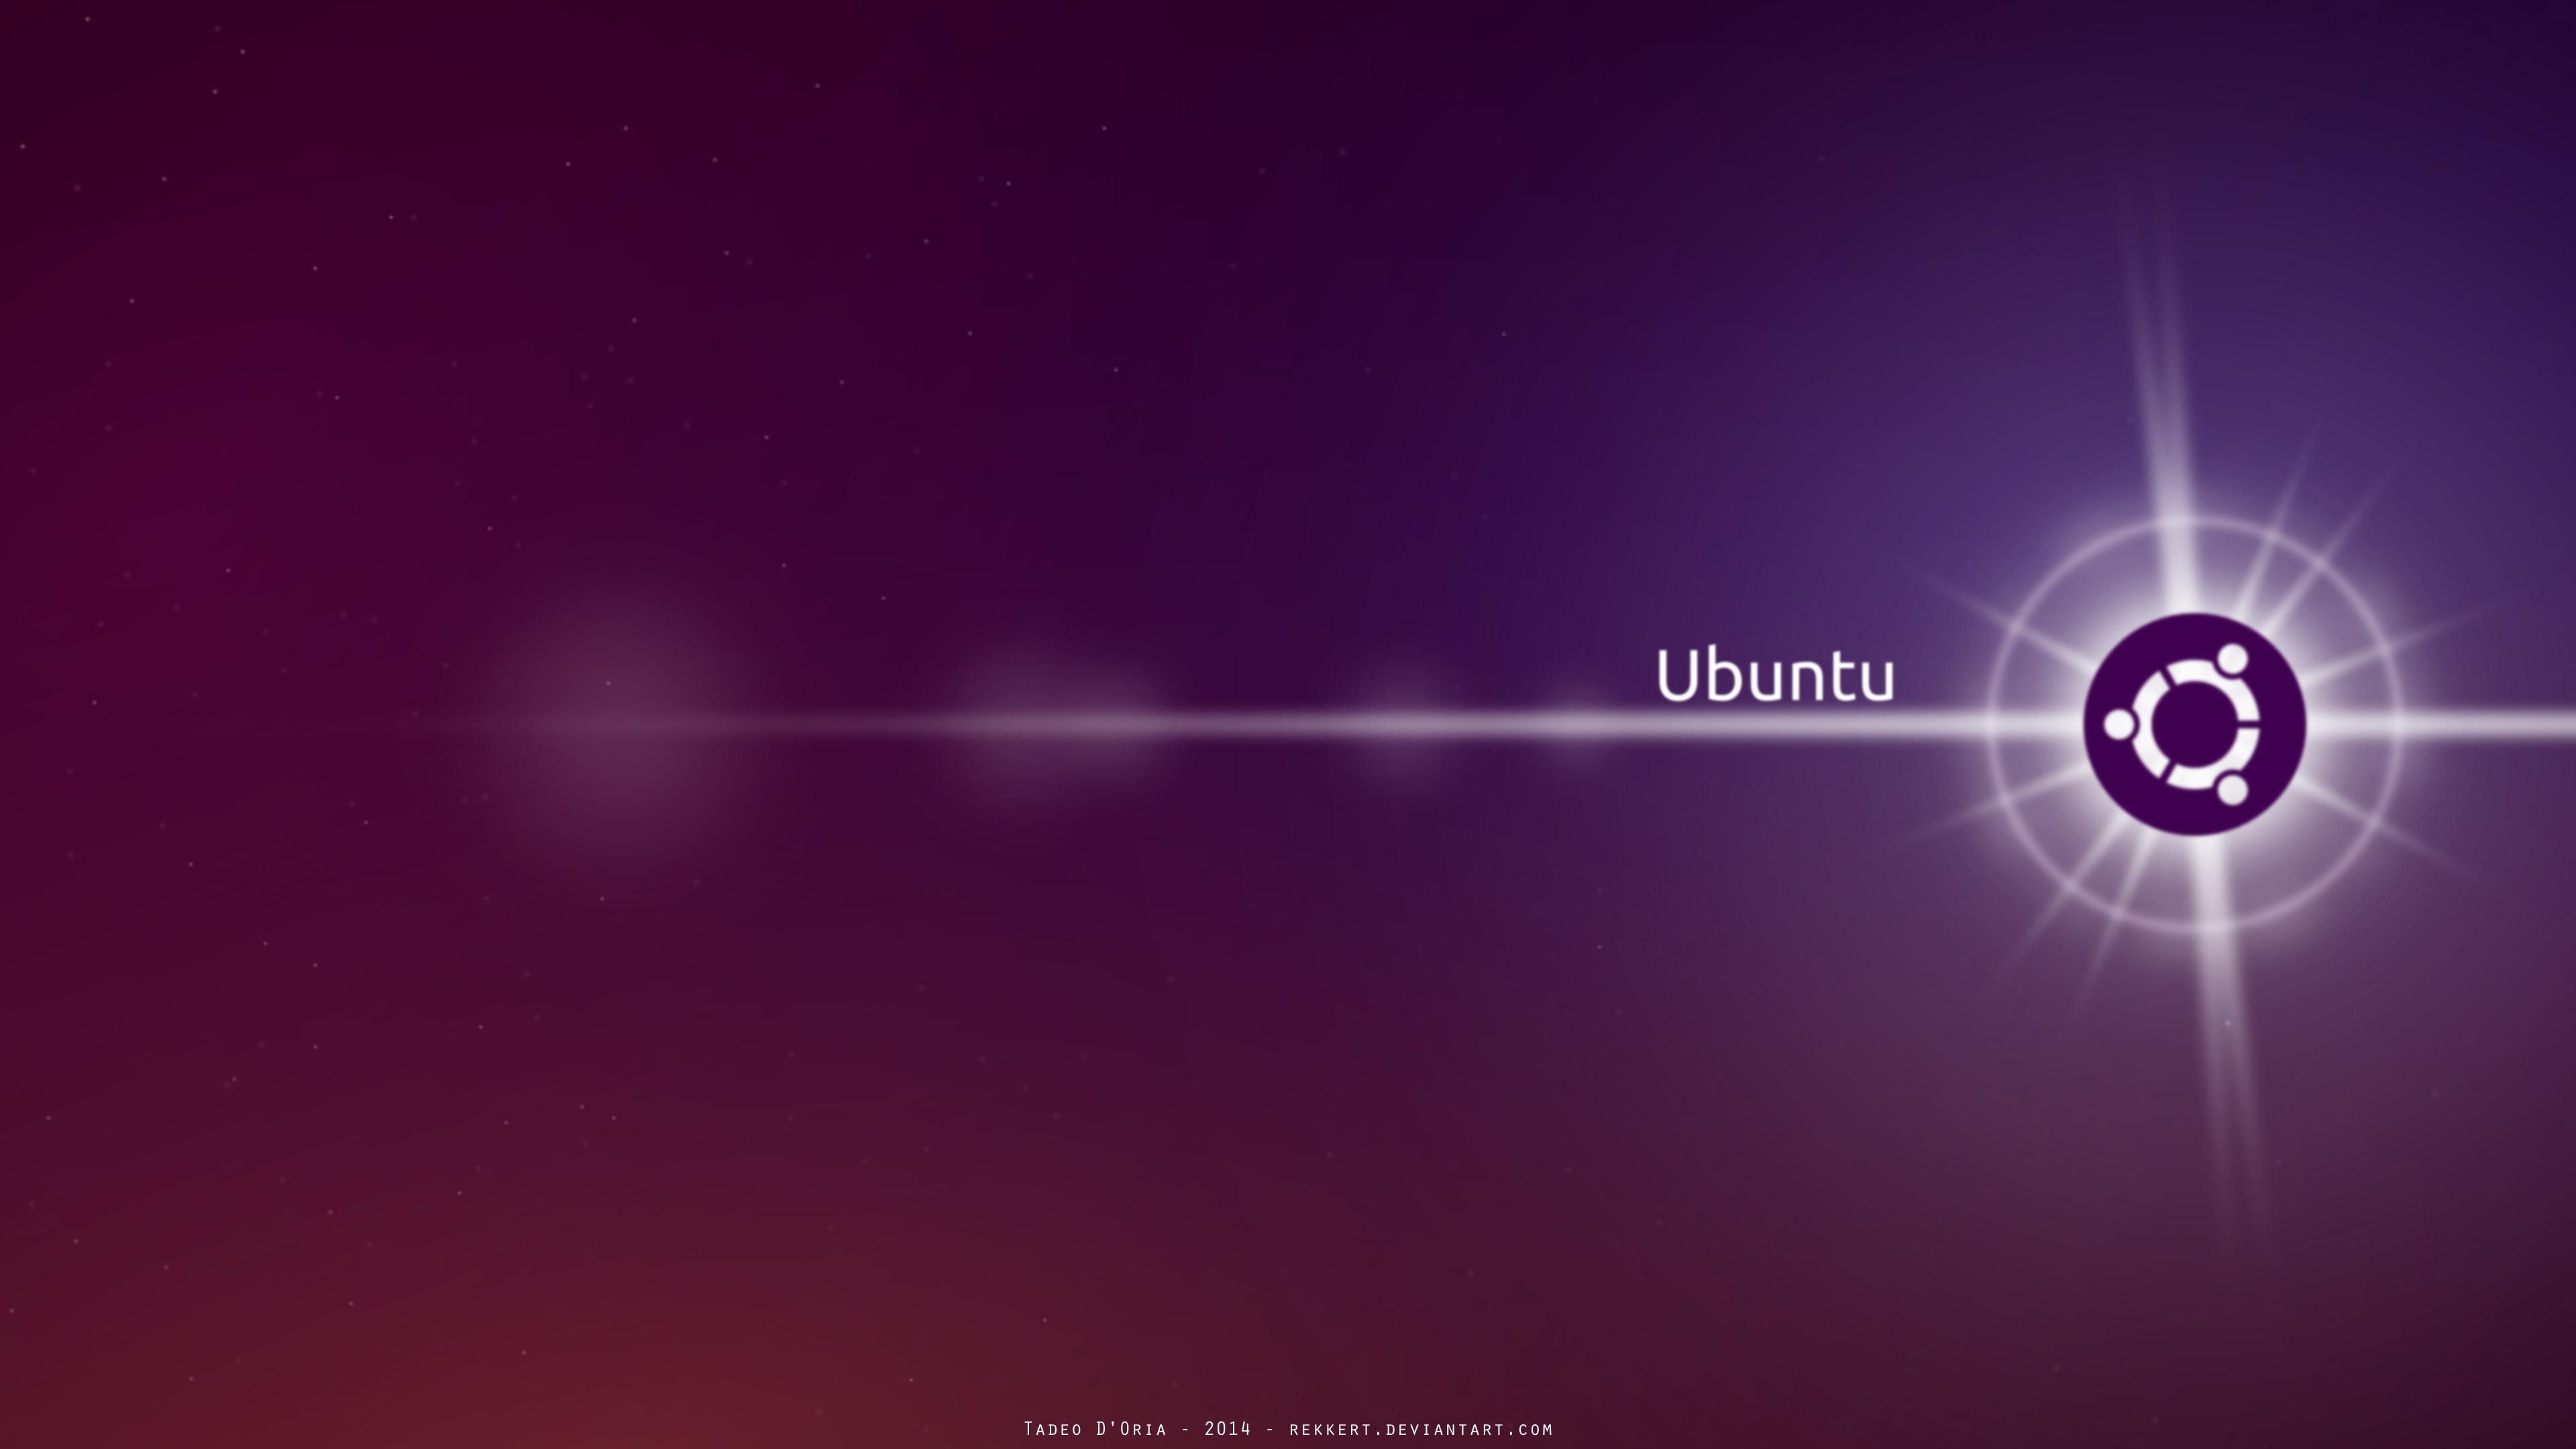 Ubuntu Wallpapers 1828   HDWPro 3840x2160